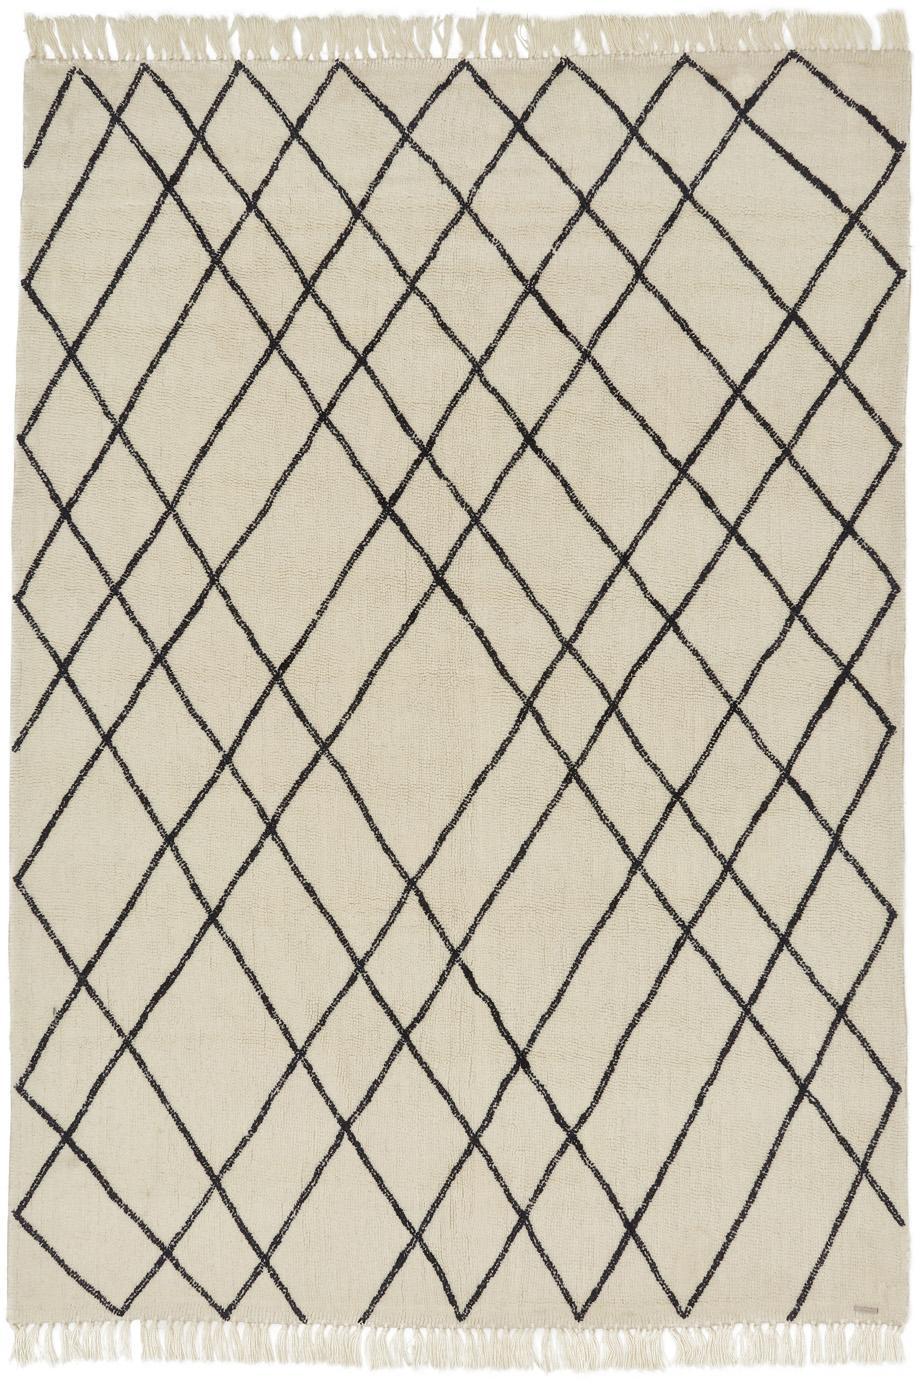 Alfombra de lana Graphic Nature, Crema, decoración irregular en negro, An 200 x L 300 cm (Tamaño L)